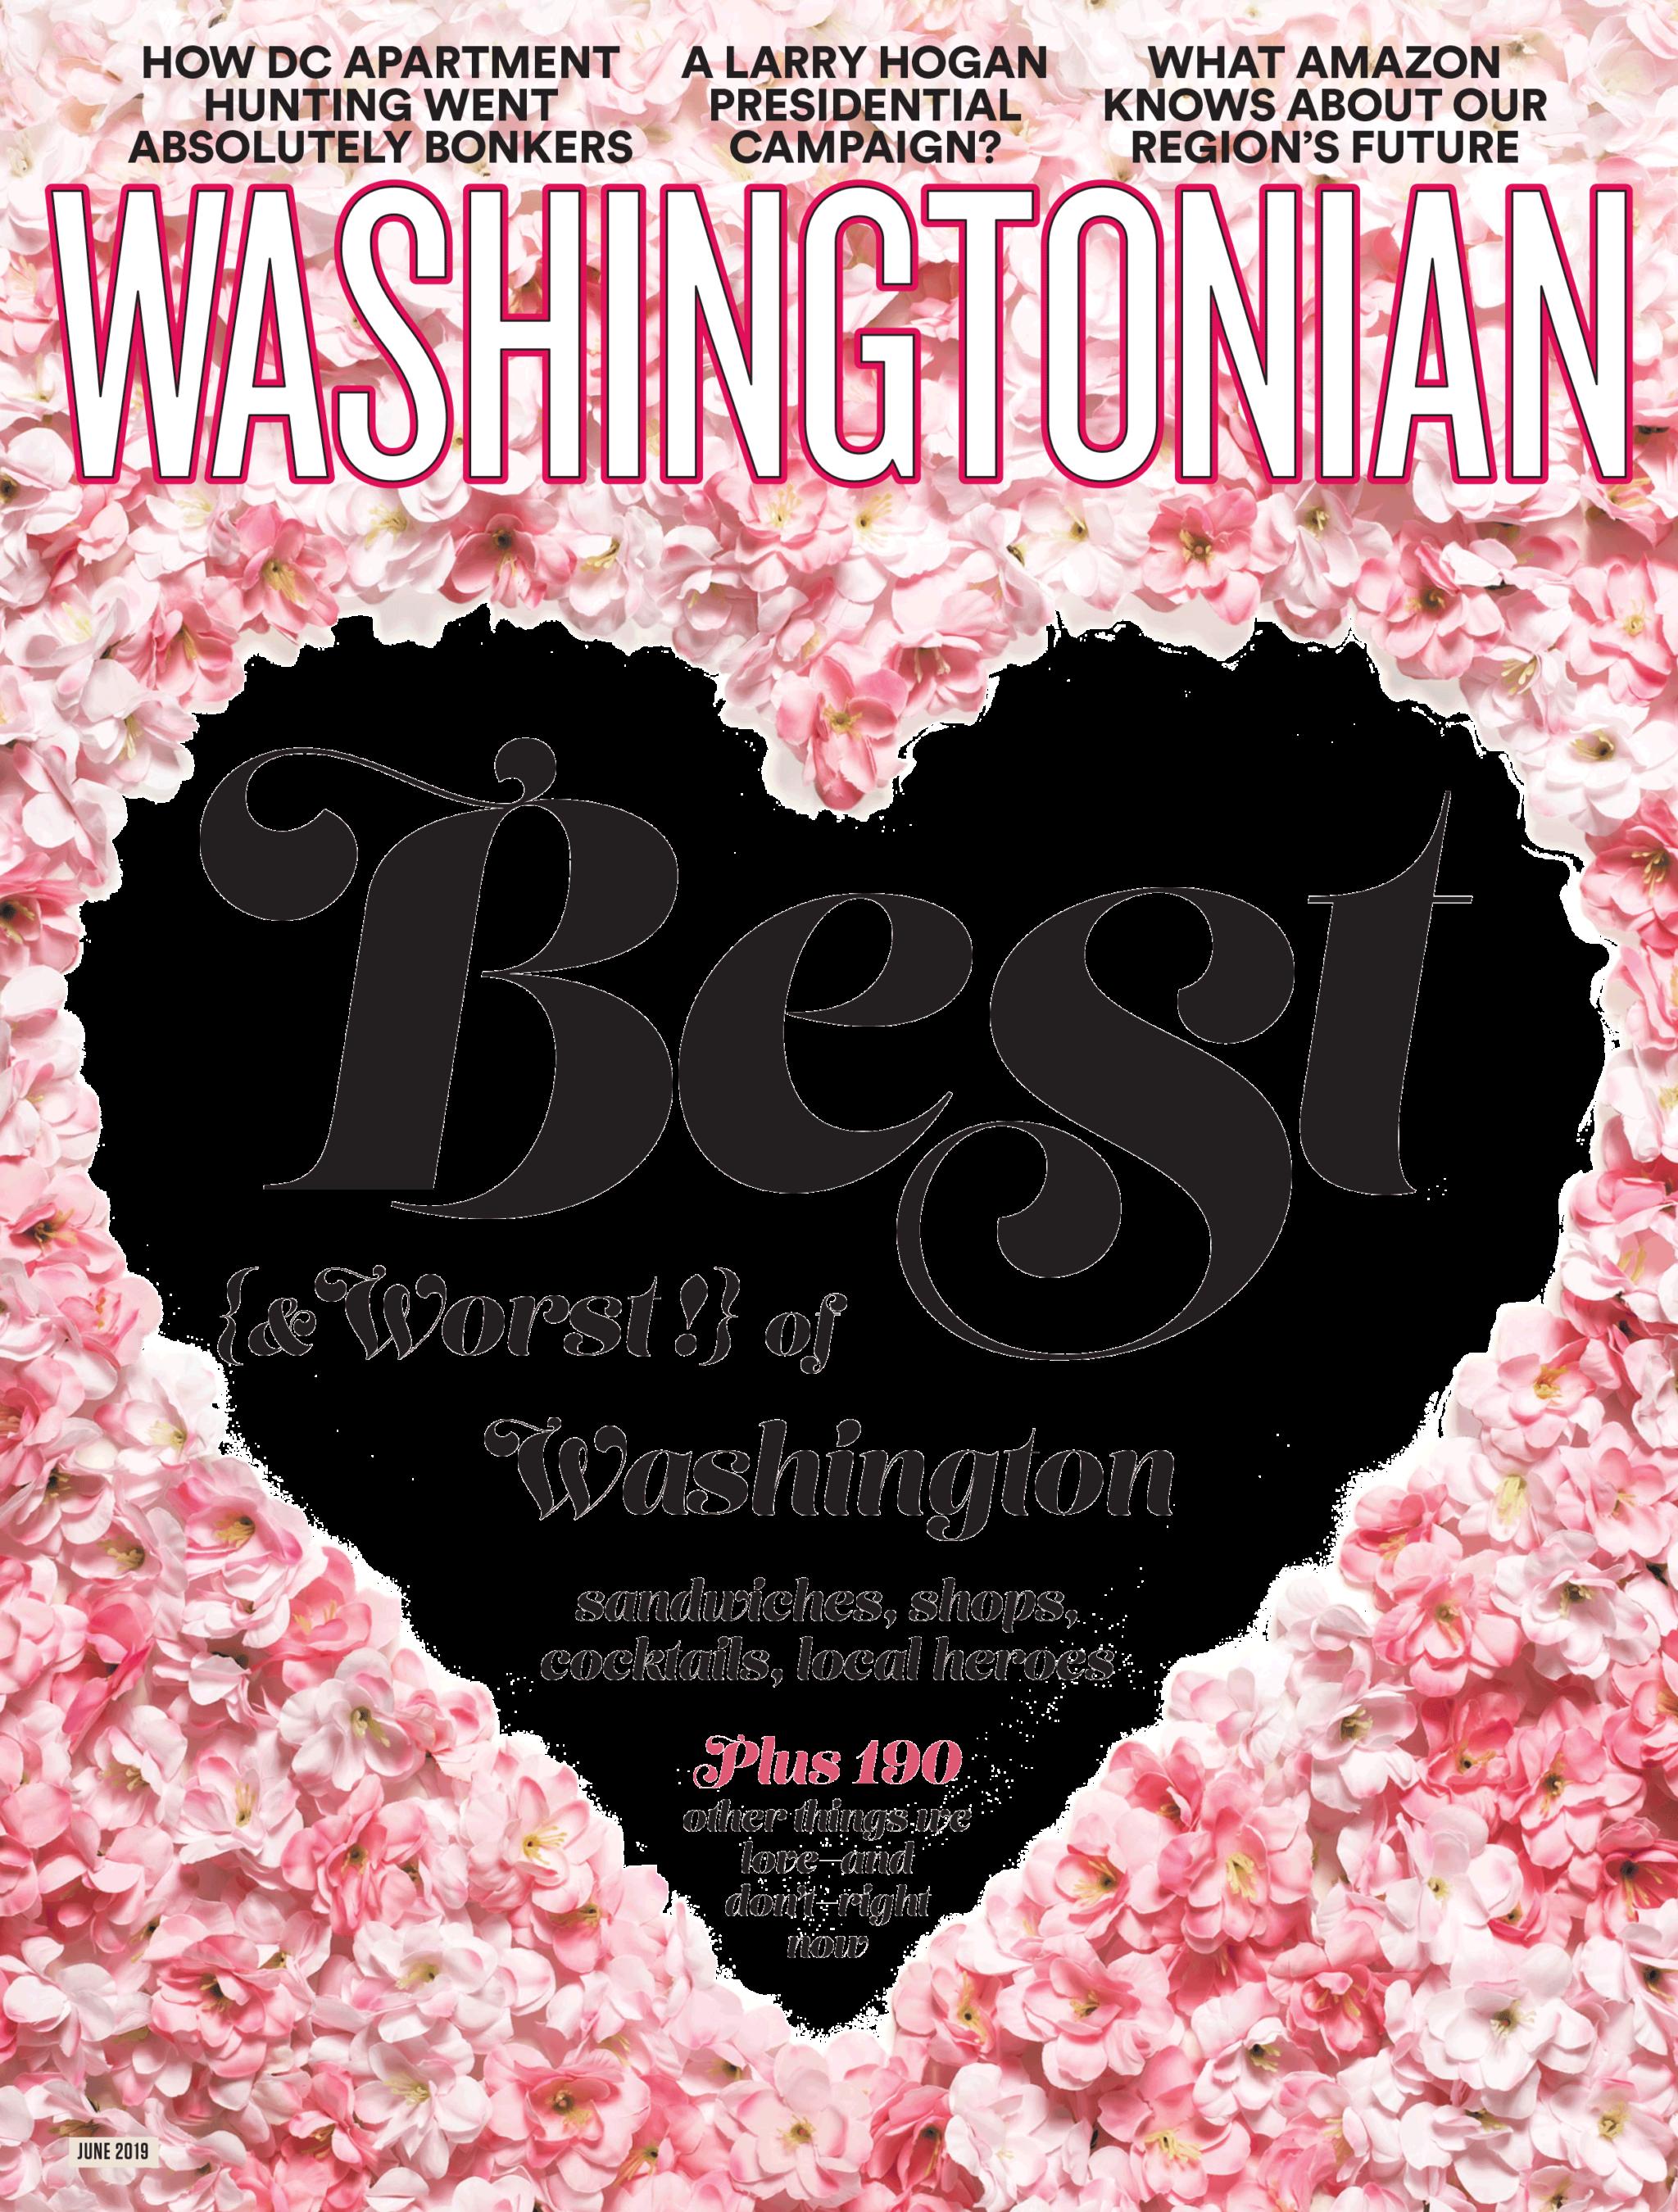 June 2019: Best and Worst of Washington